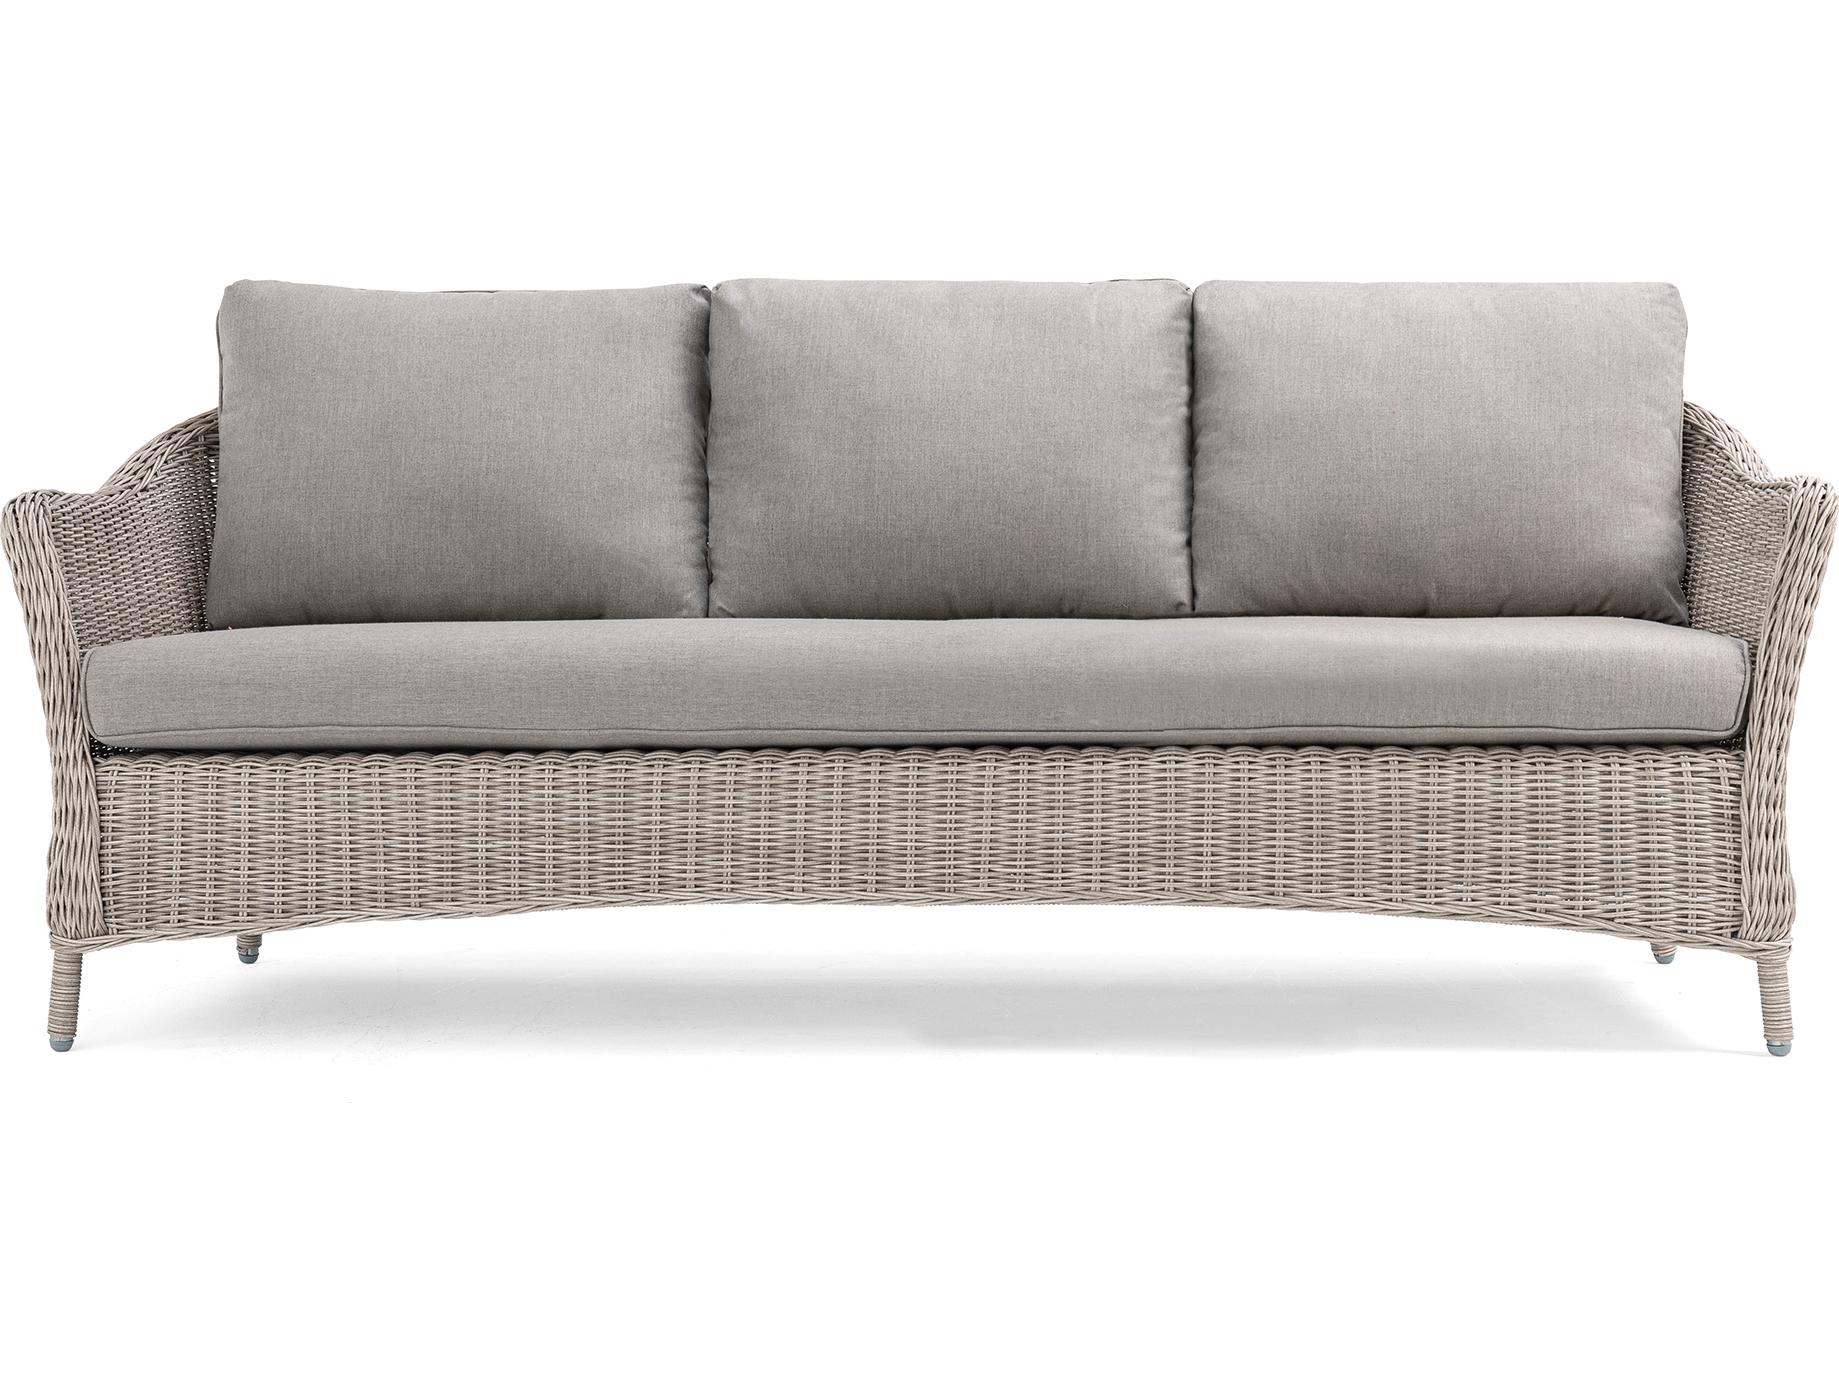 La Z Boy Quick Ship Laurel Cushion Gray Wicker Sofa In Within 2018 Laurel Gray Sofas (View 2 of 15)